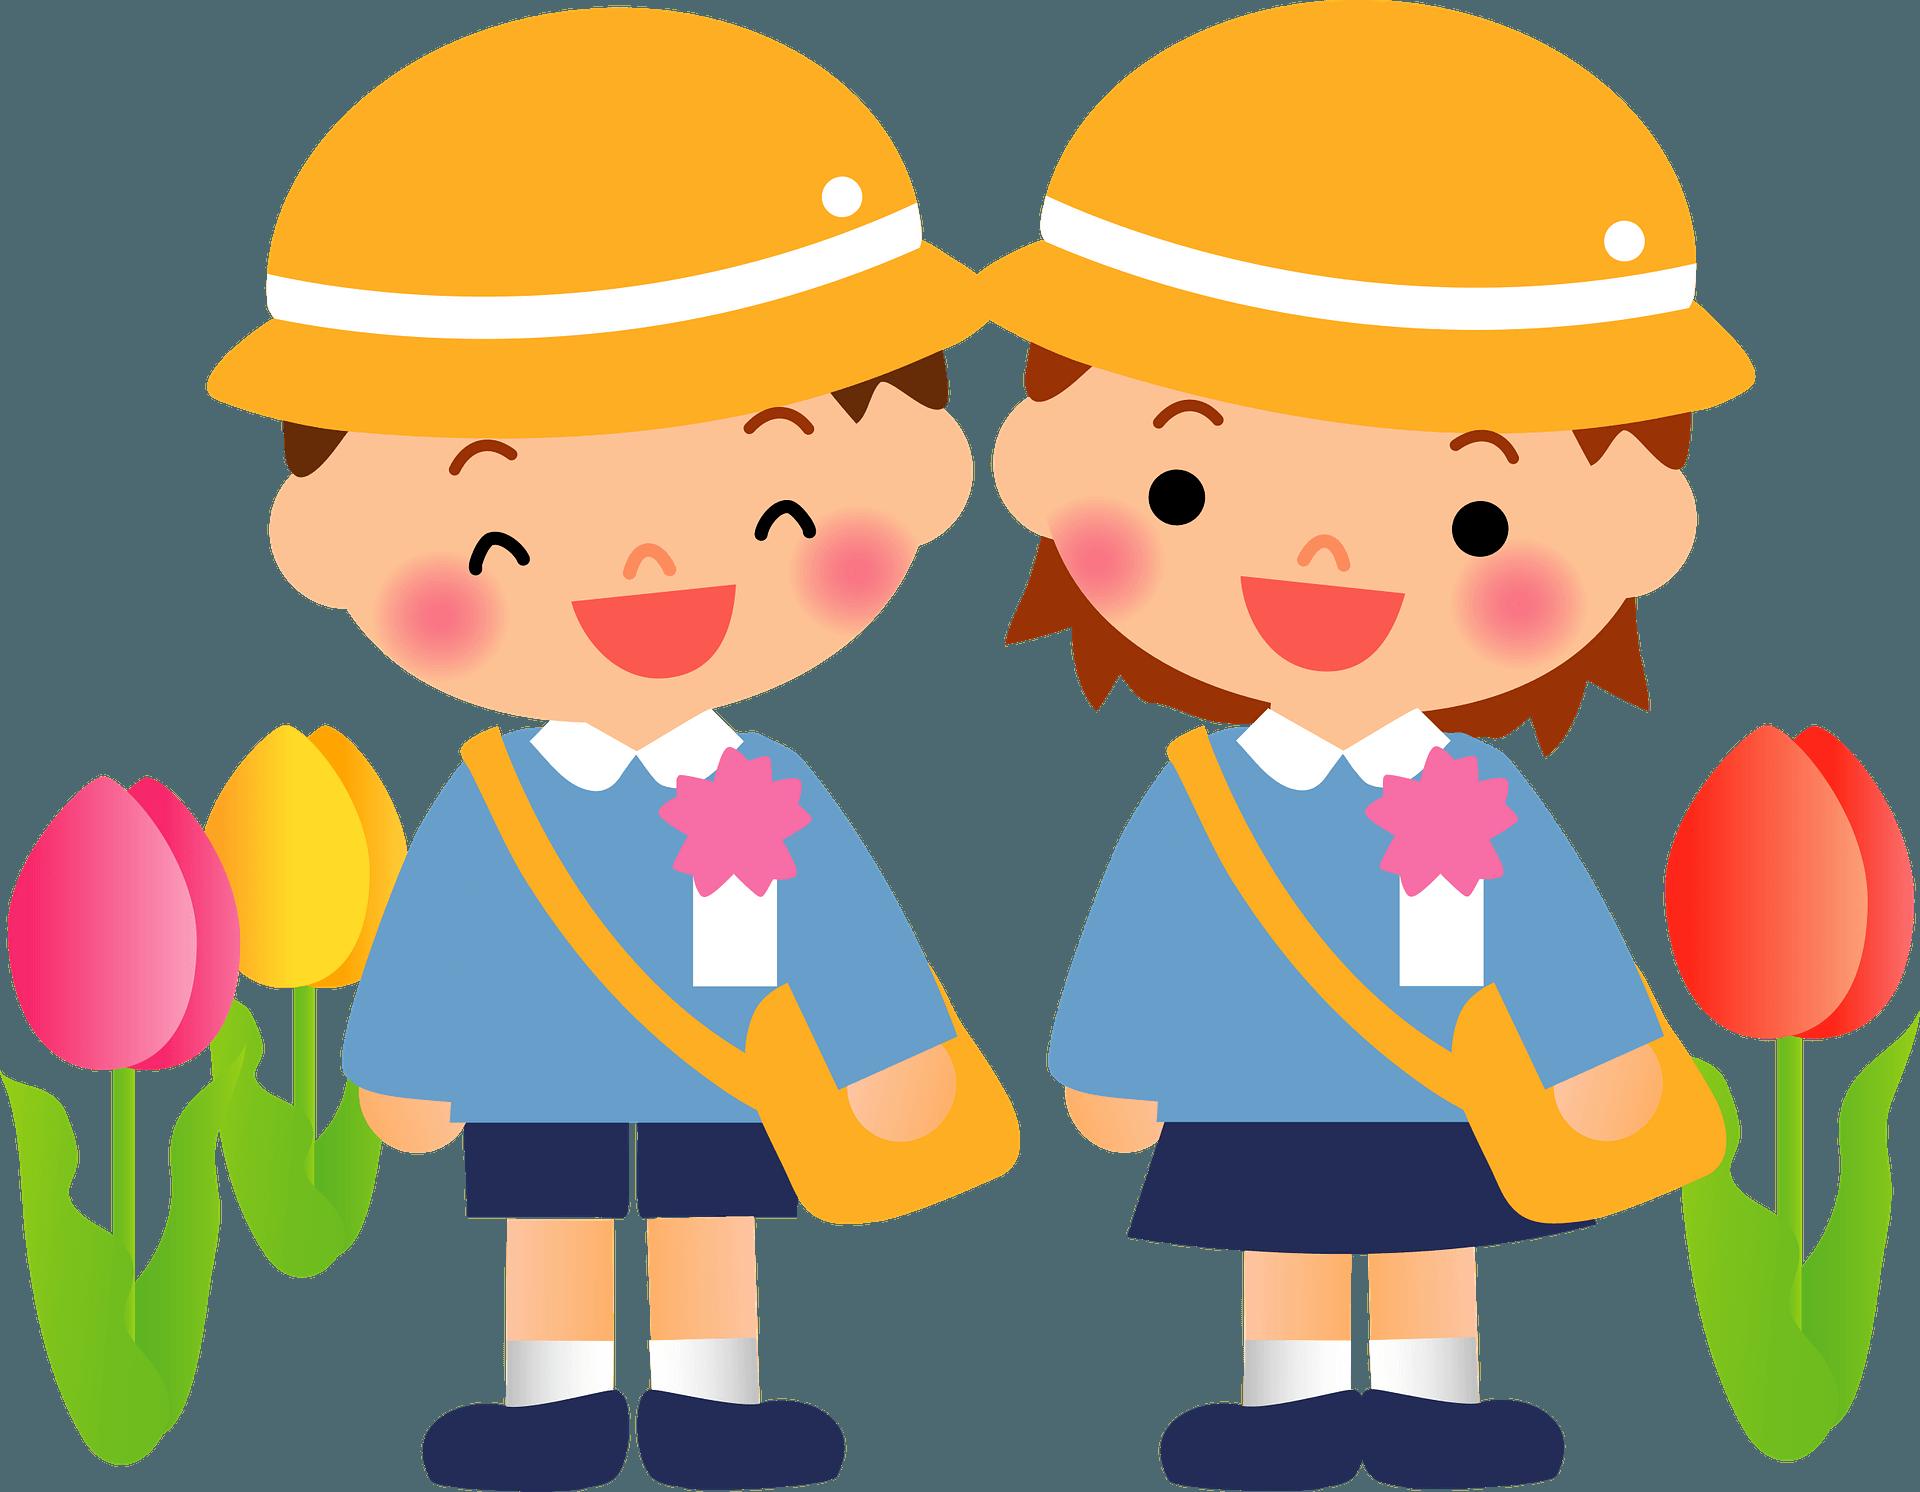 Kindergarten Children Clipart Free Download Transparent Png Creazilla